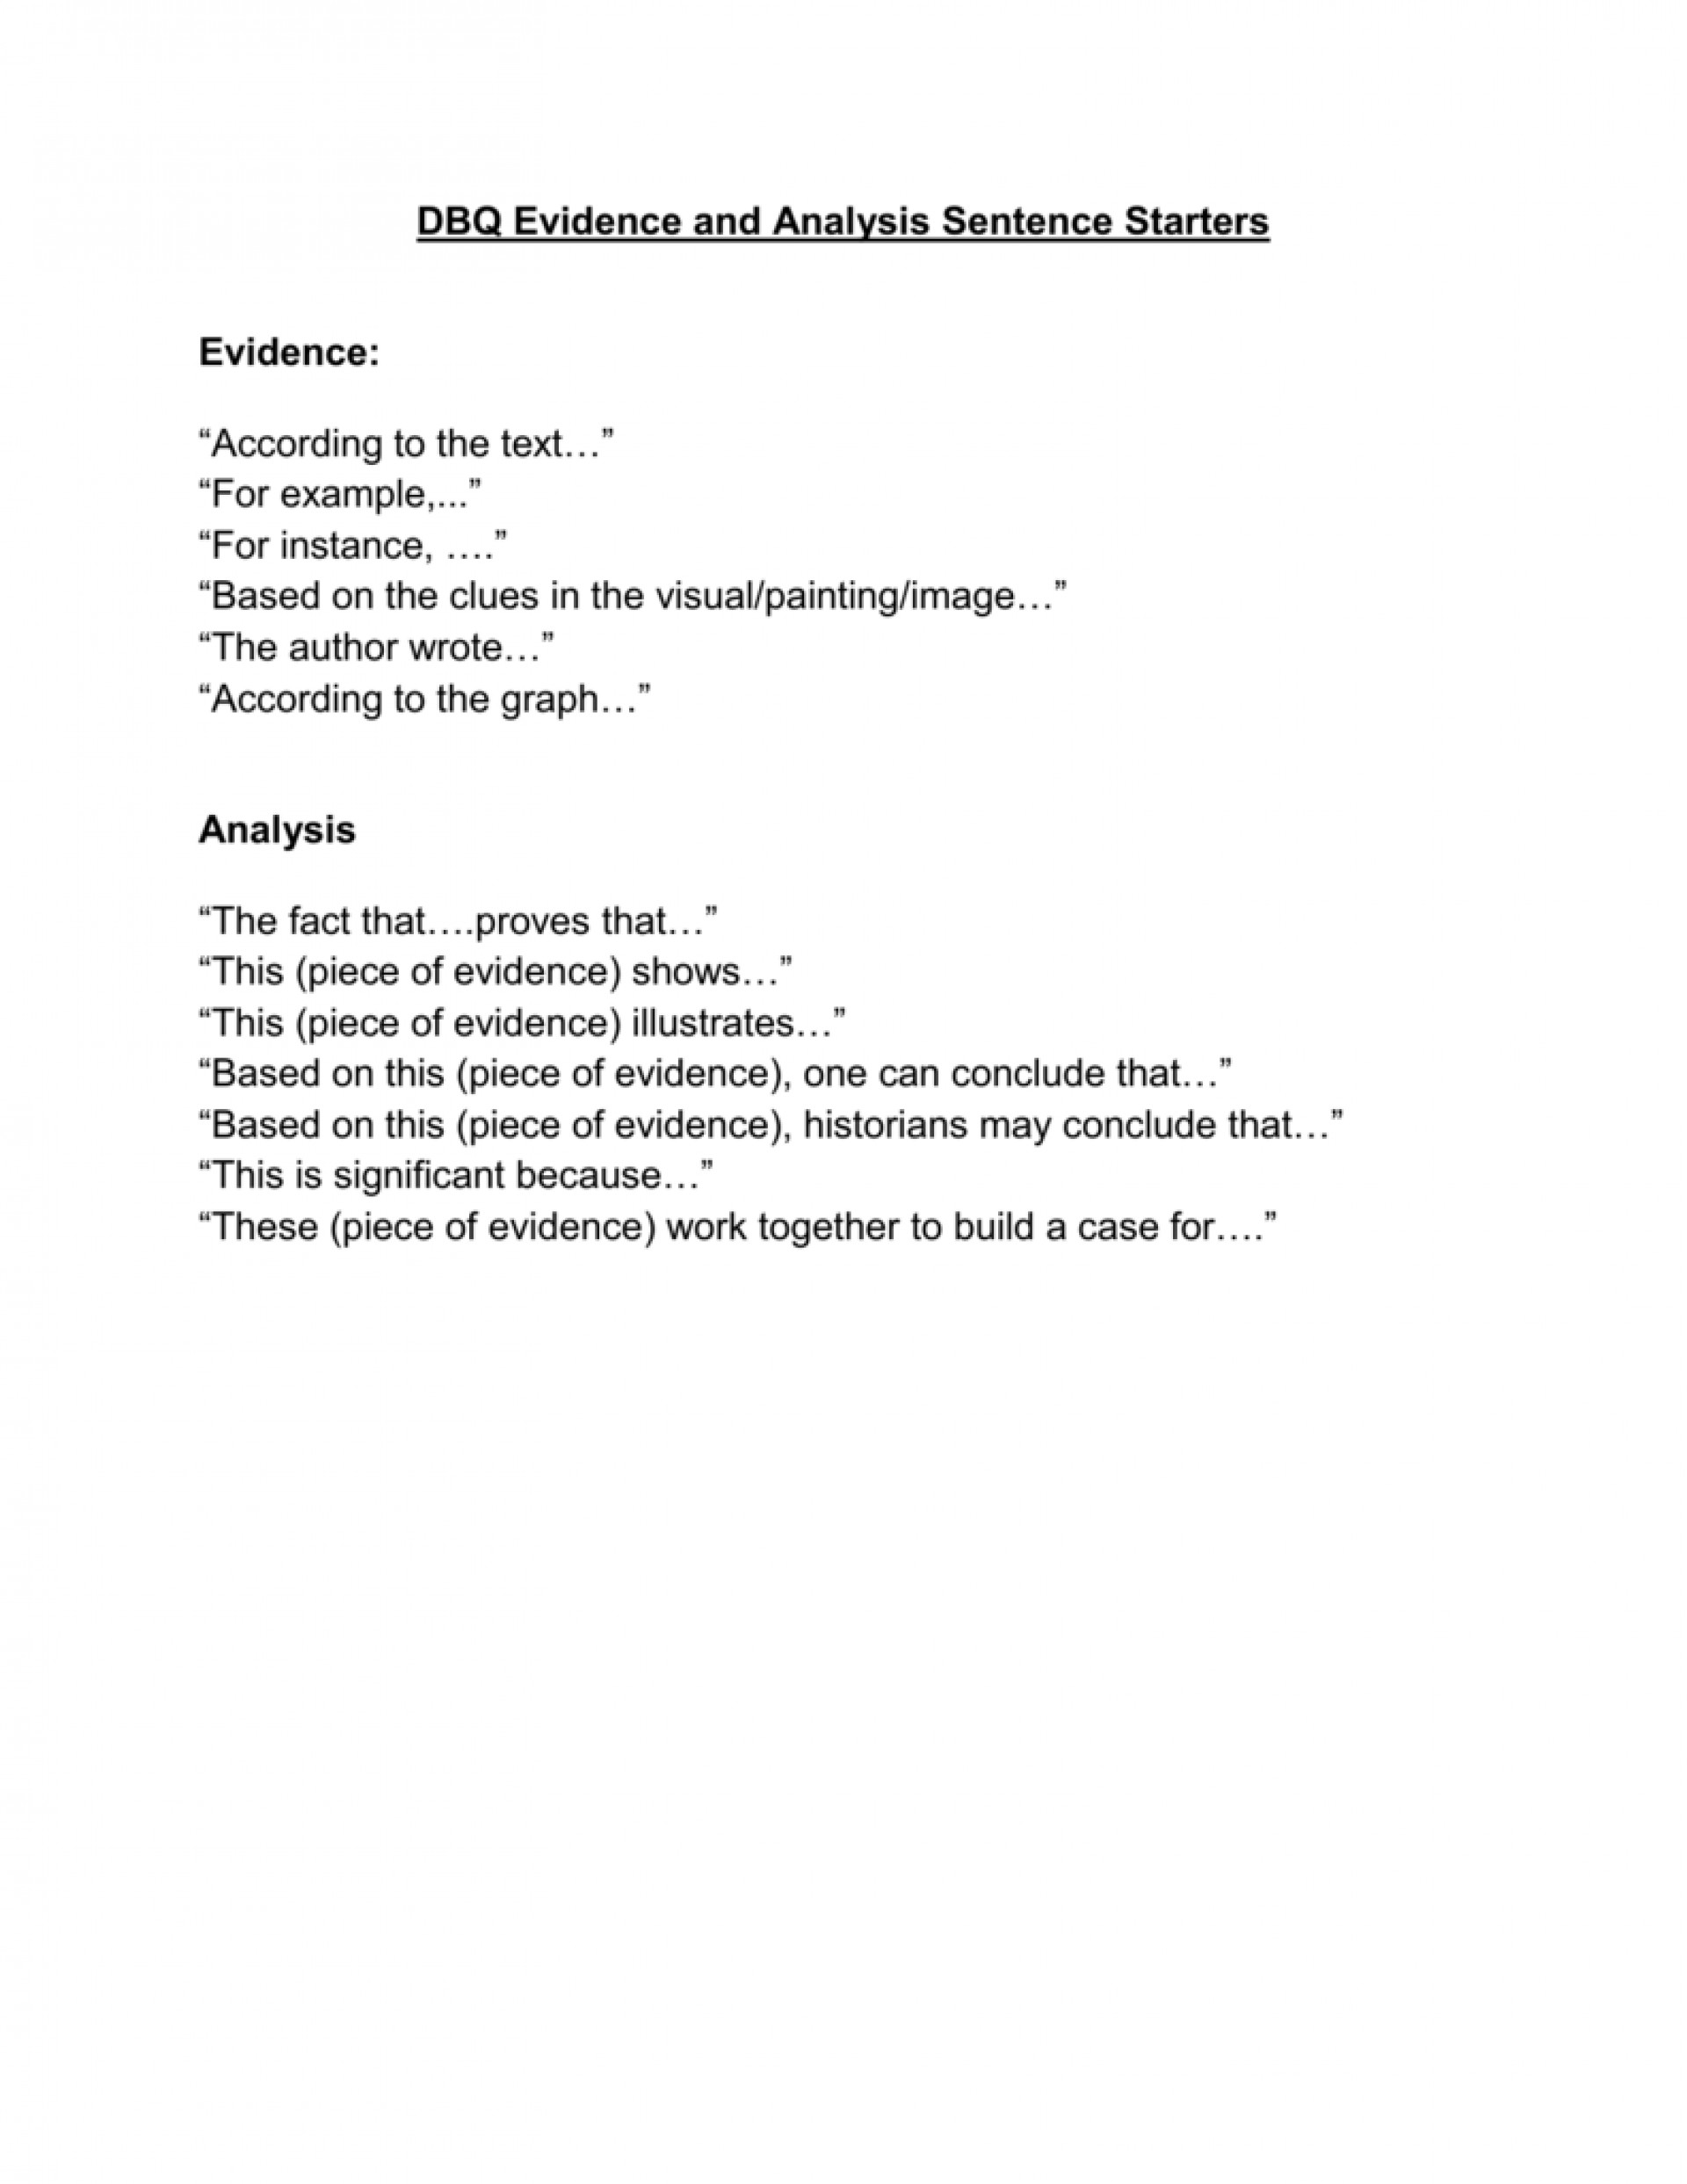 005 Essay Example 006841680 1 Paragraph Excellent Starters Sentence Spanish Gcse 1920